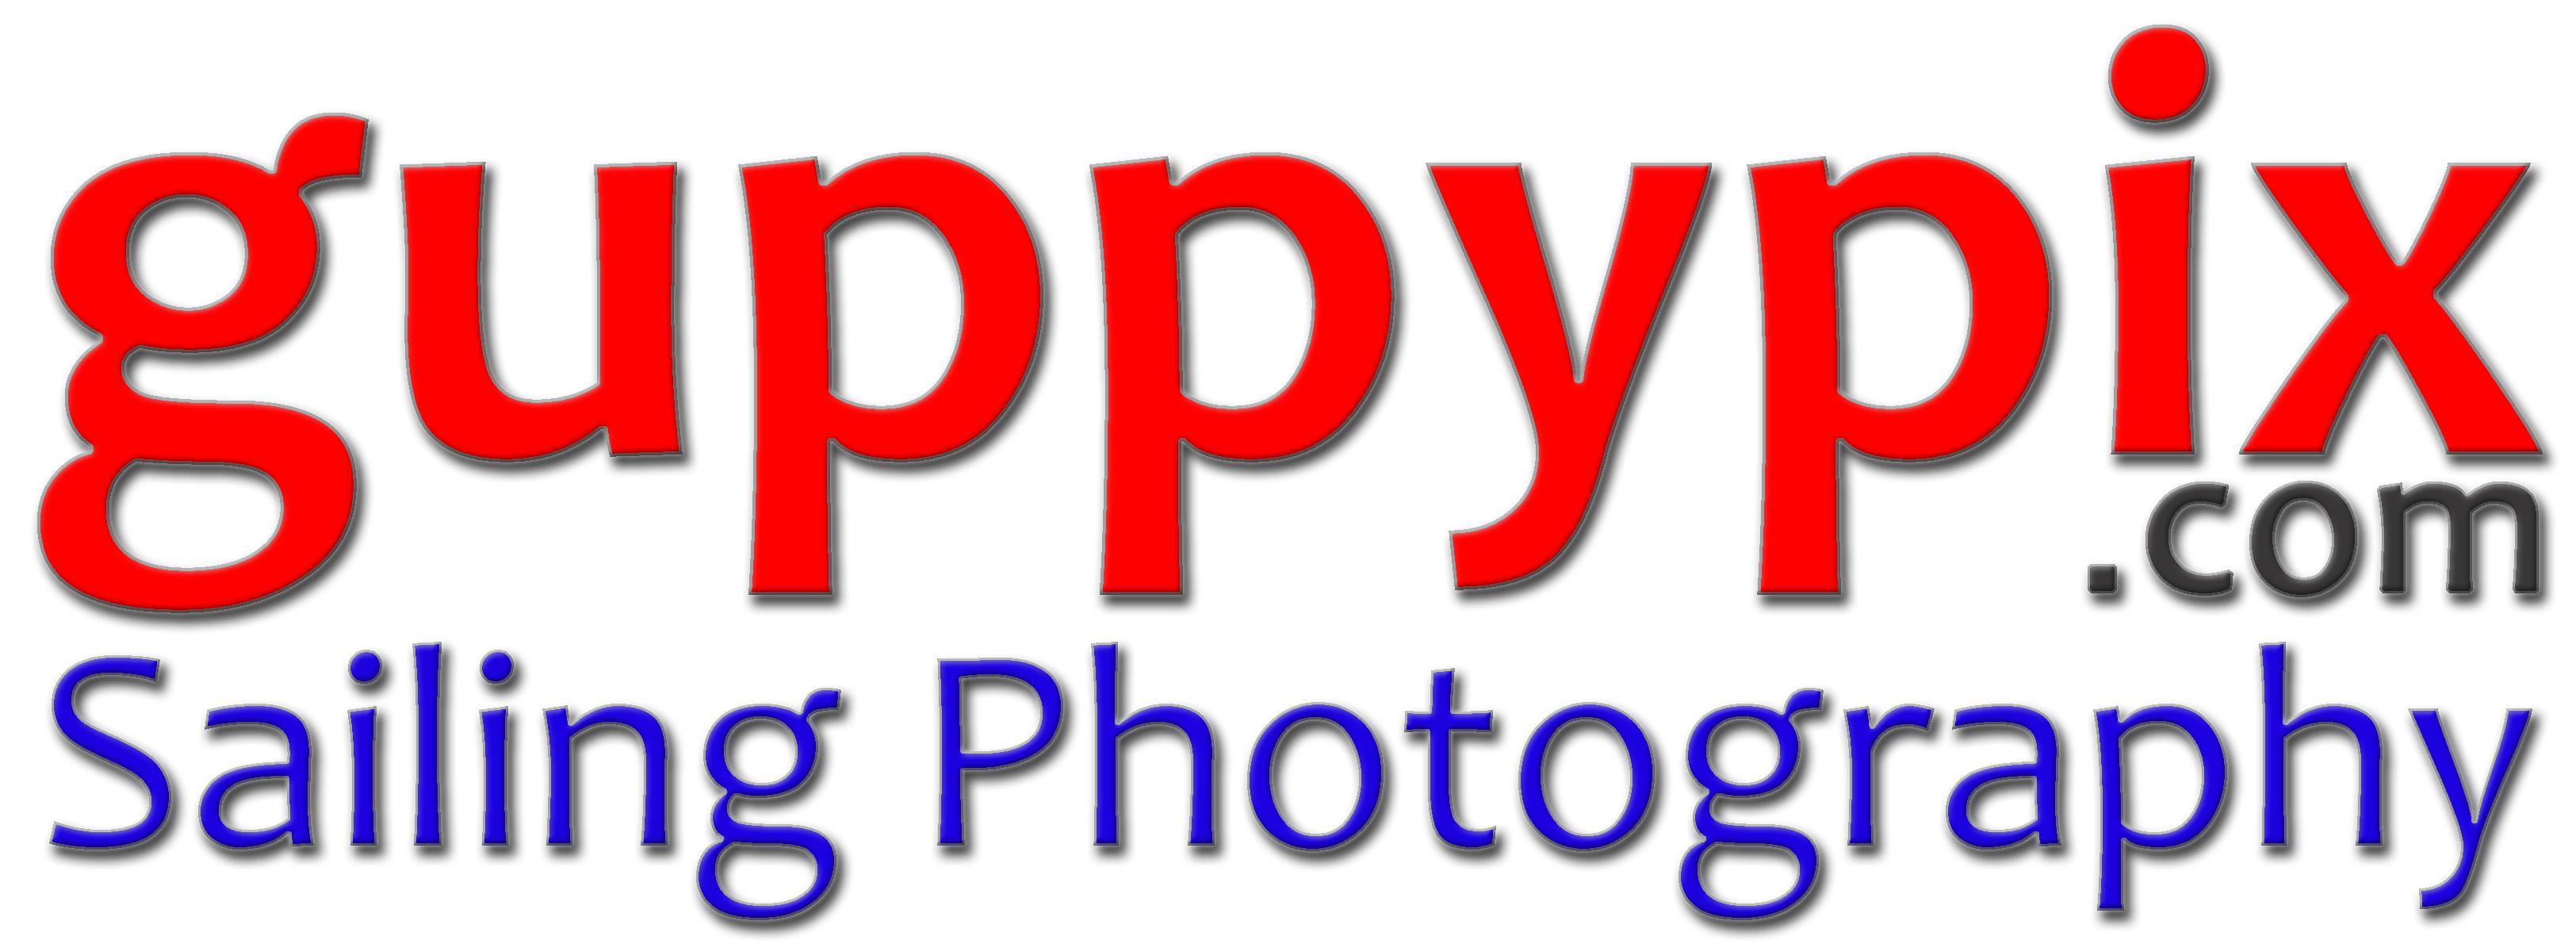 Gordon Upton Photography